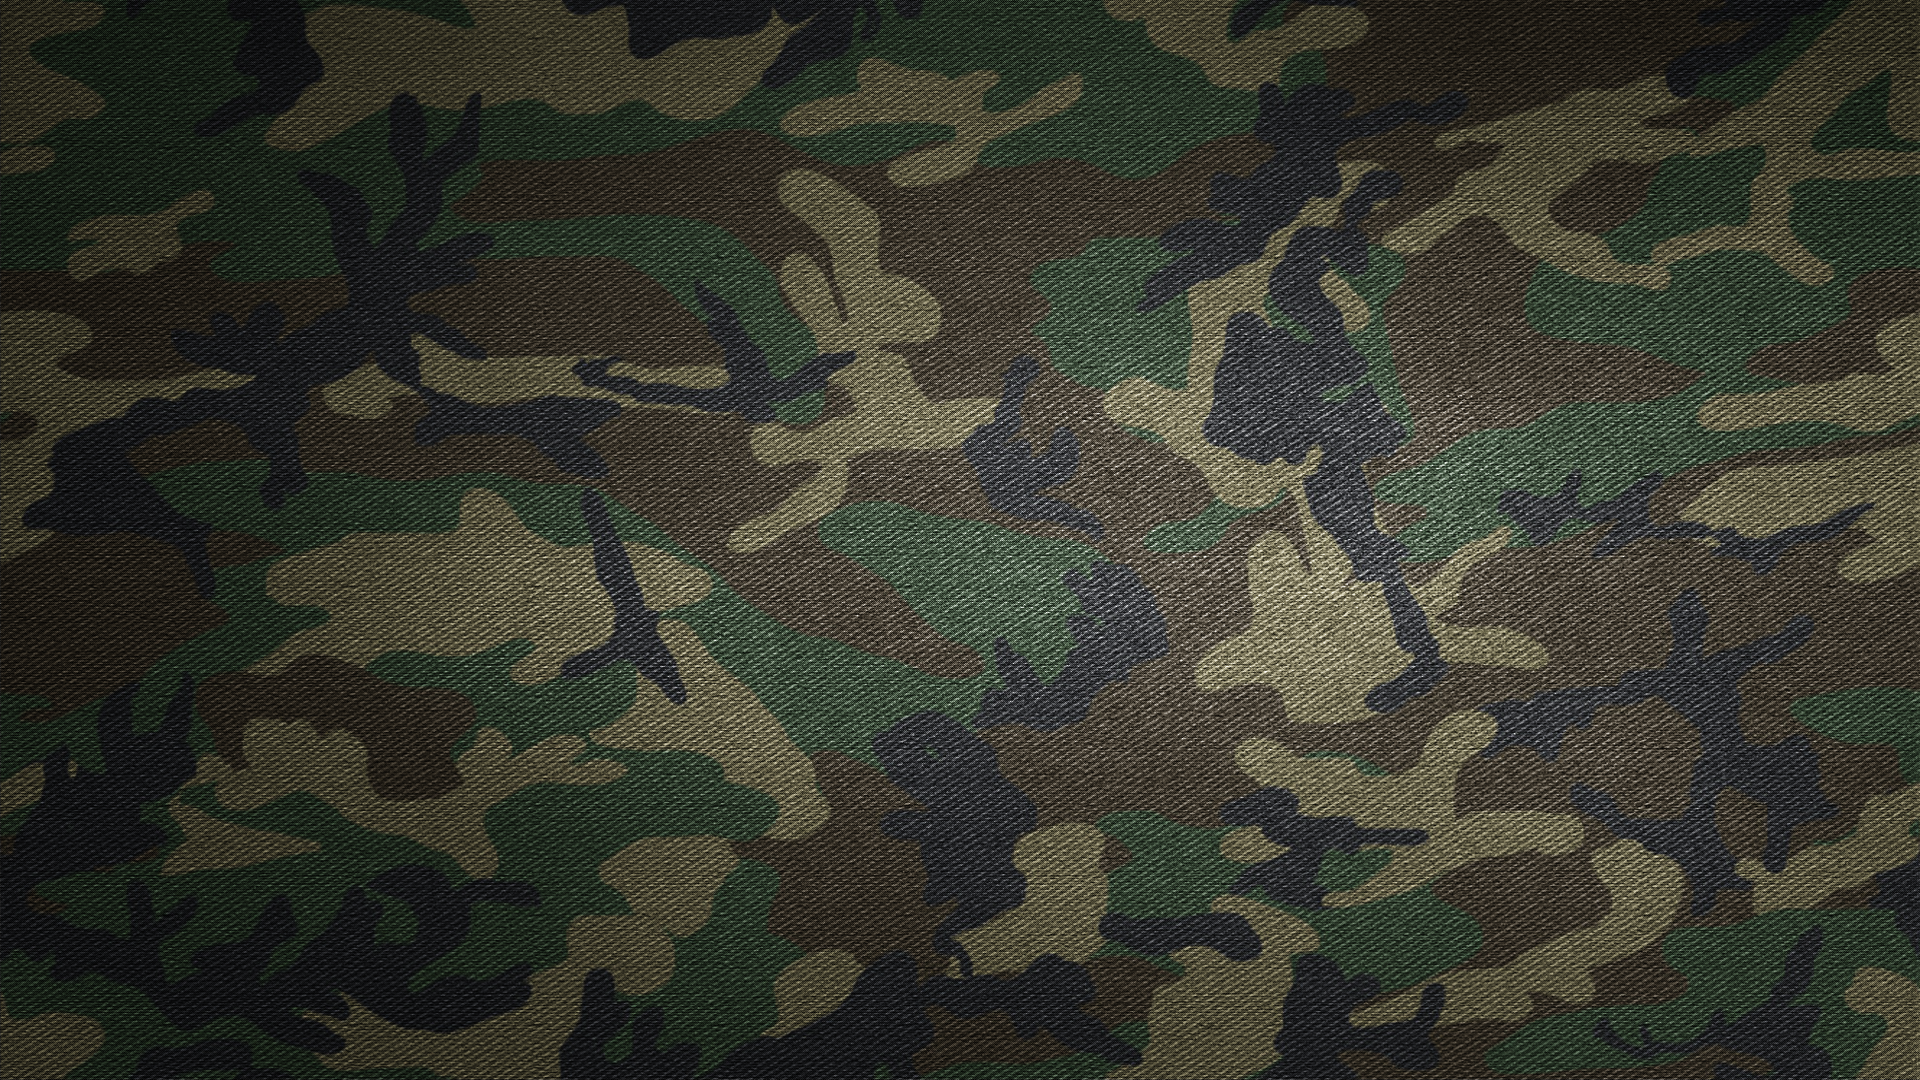 Military Camo Wallpaper   HD Wallpapers 1920x1080